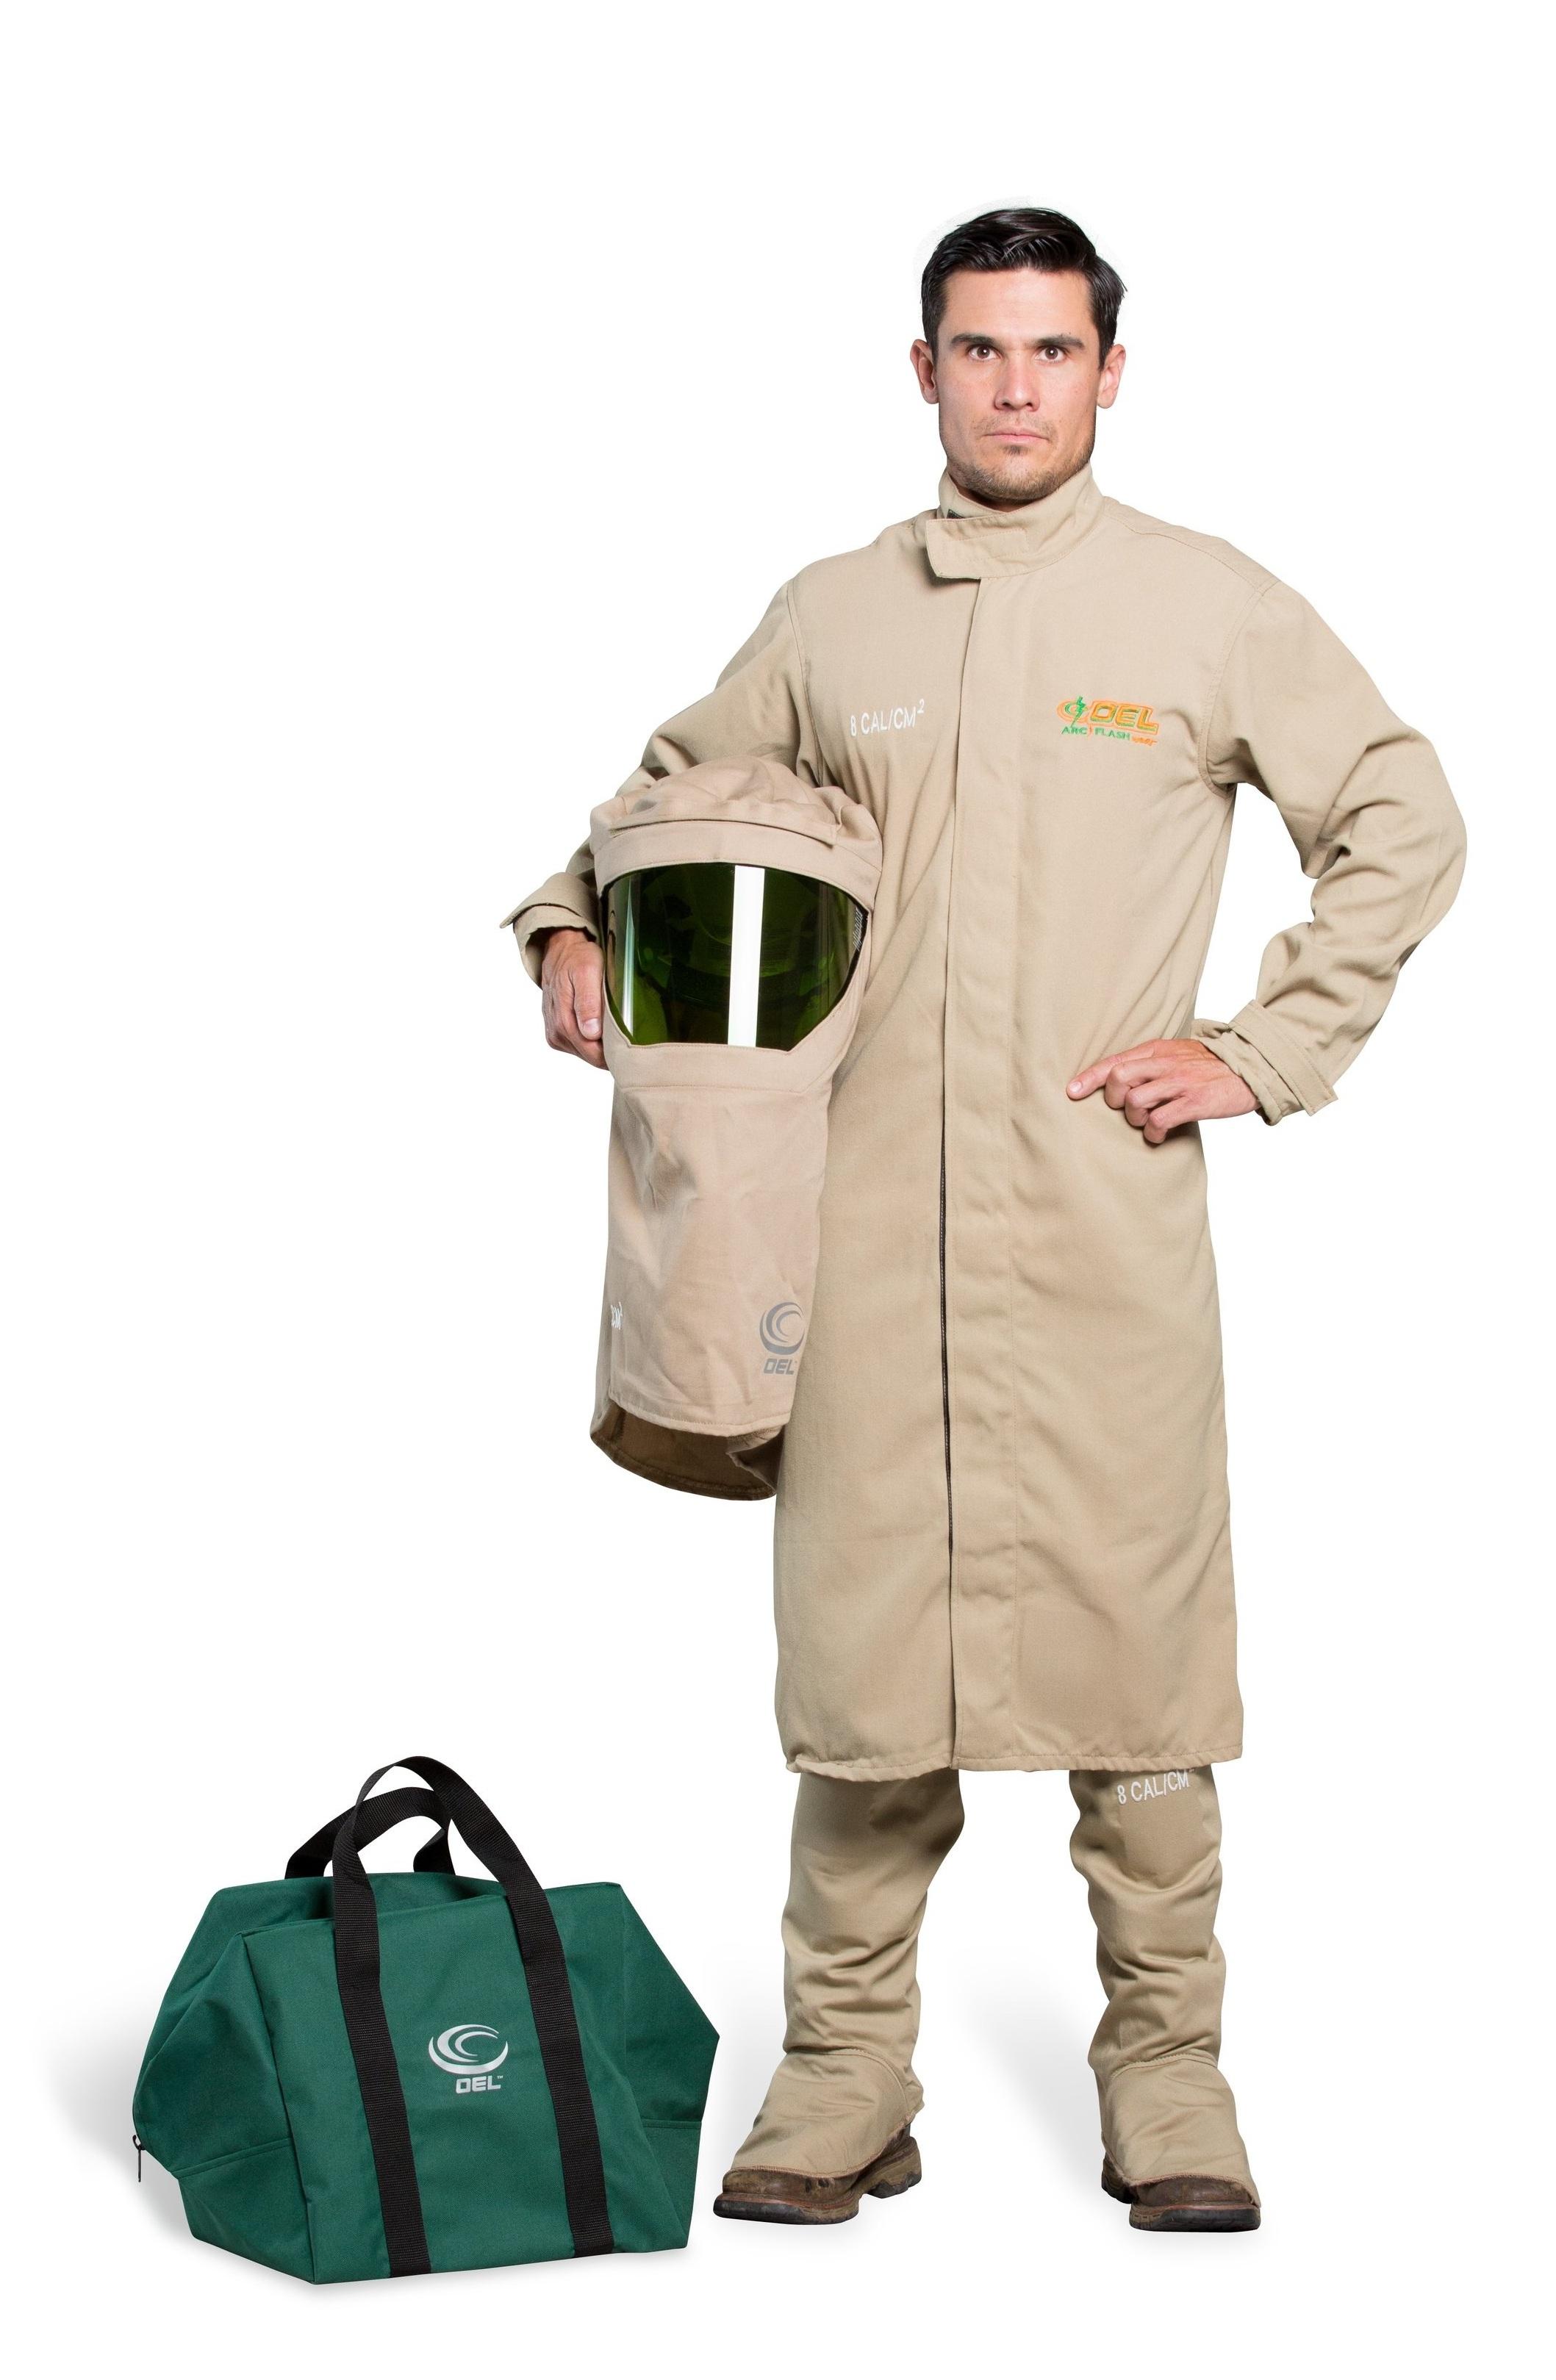 8 Cal Coat Kit with SwitchGear Hood